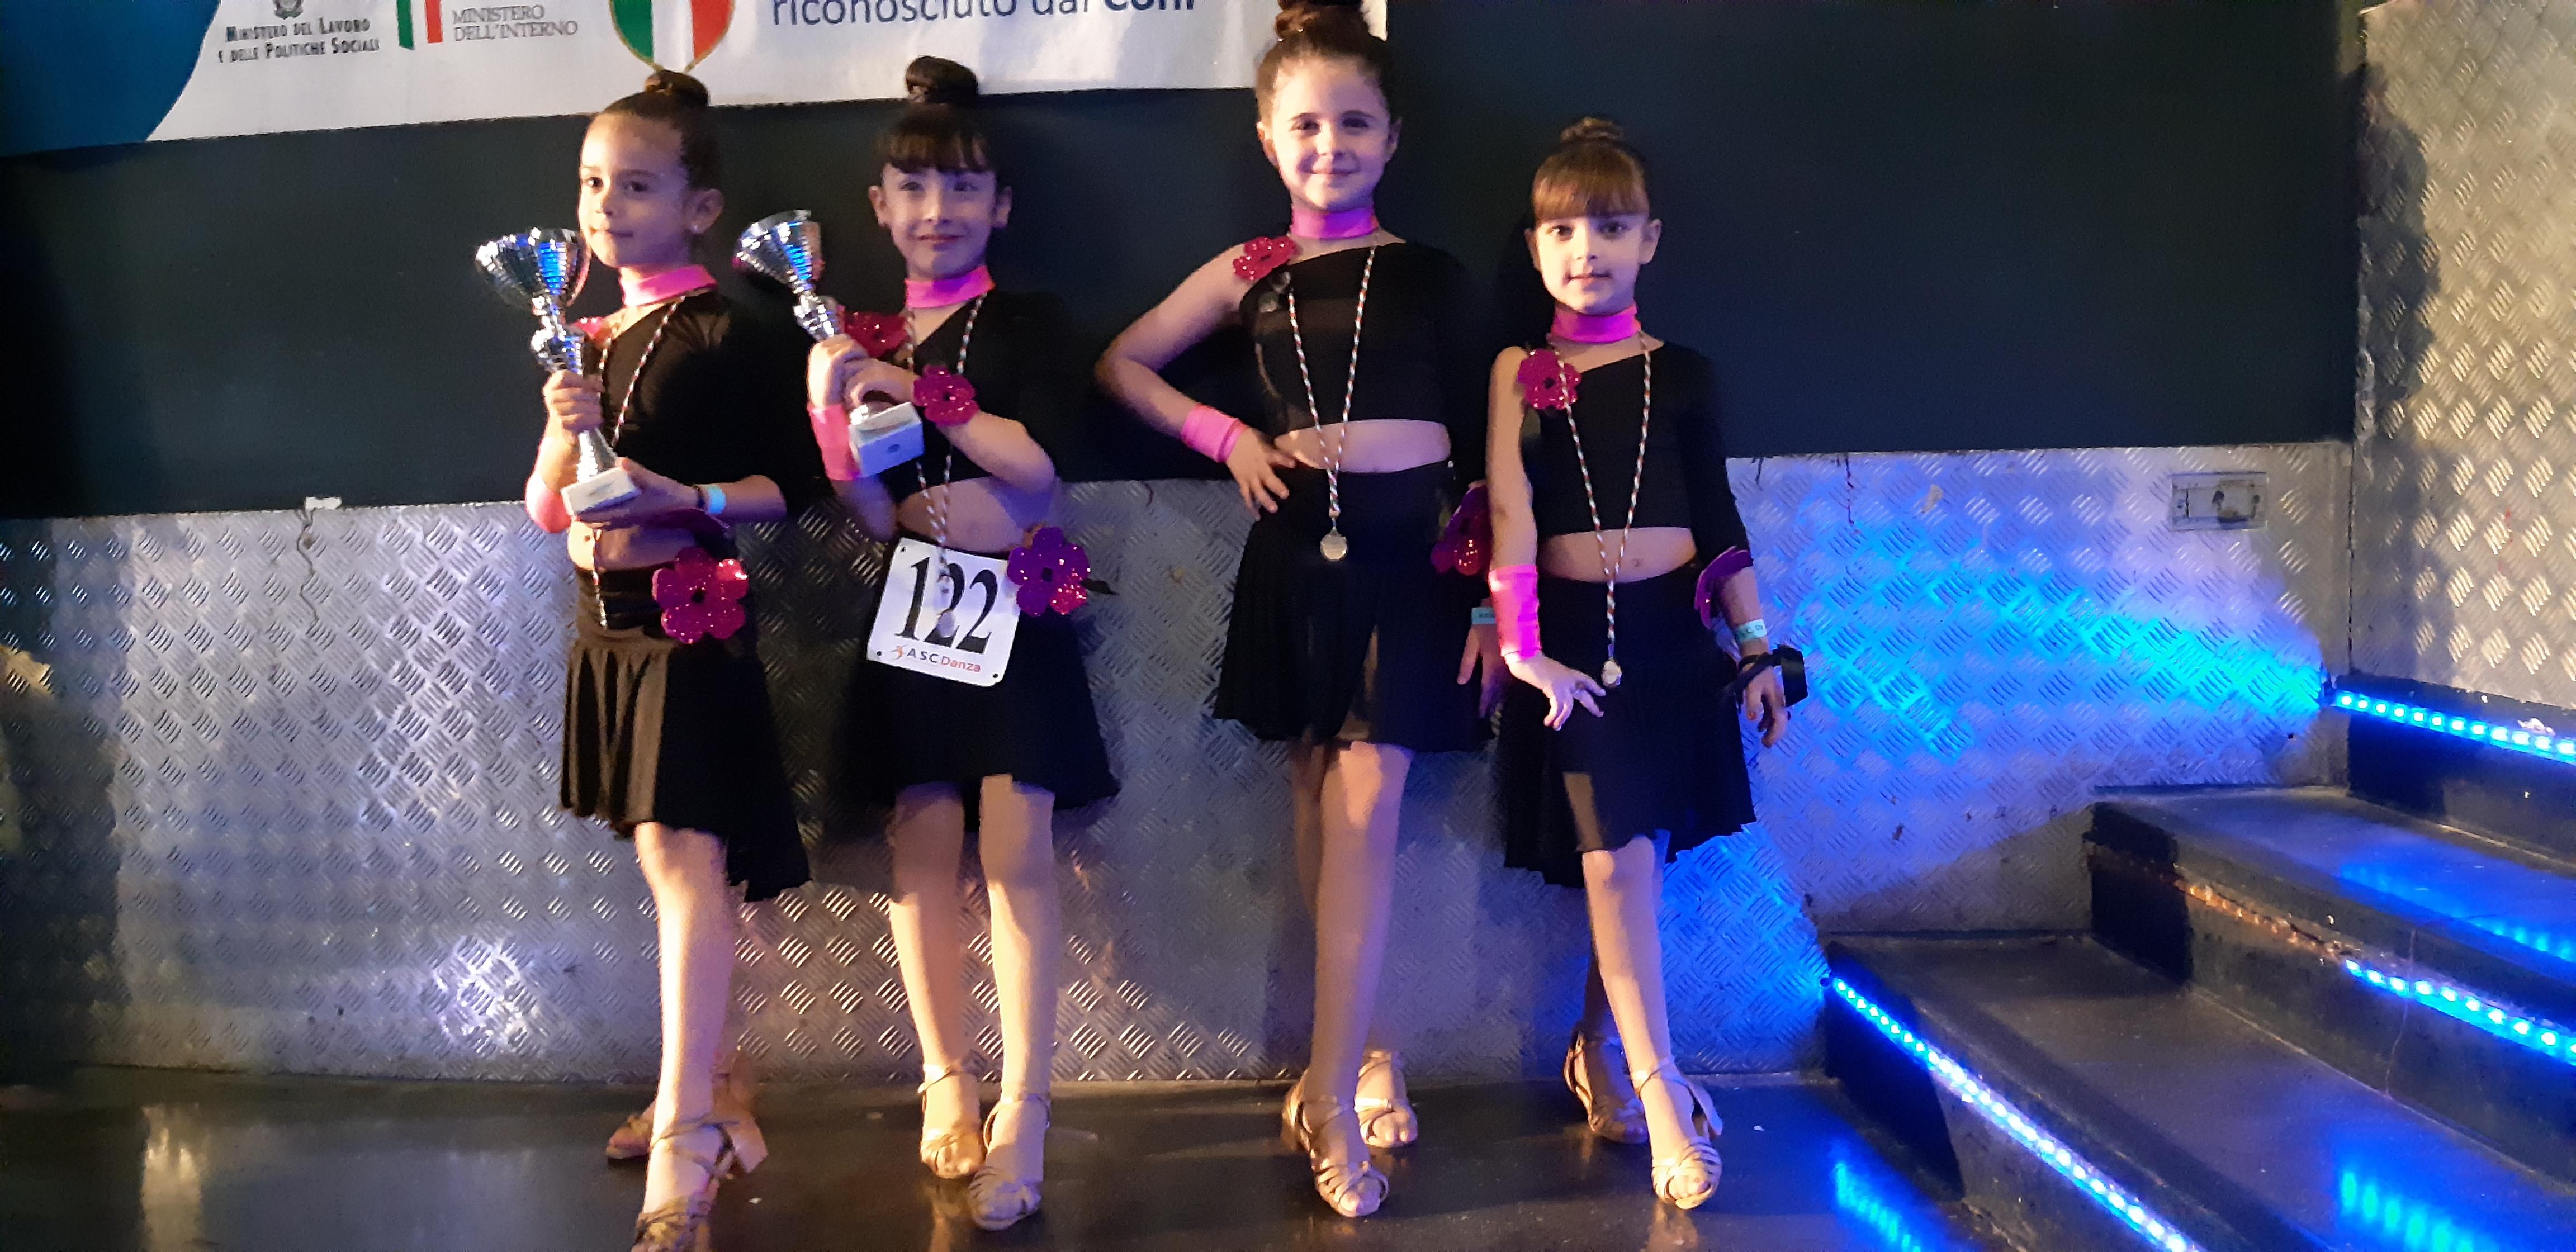 Trofeo Stardust Ludo Dance